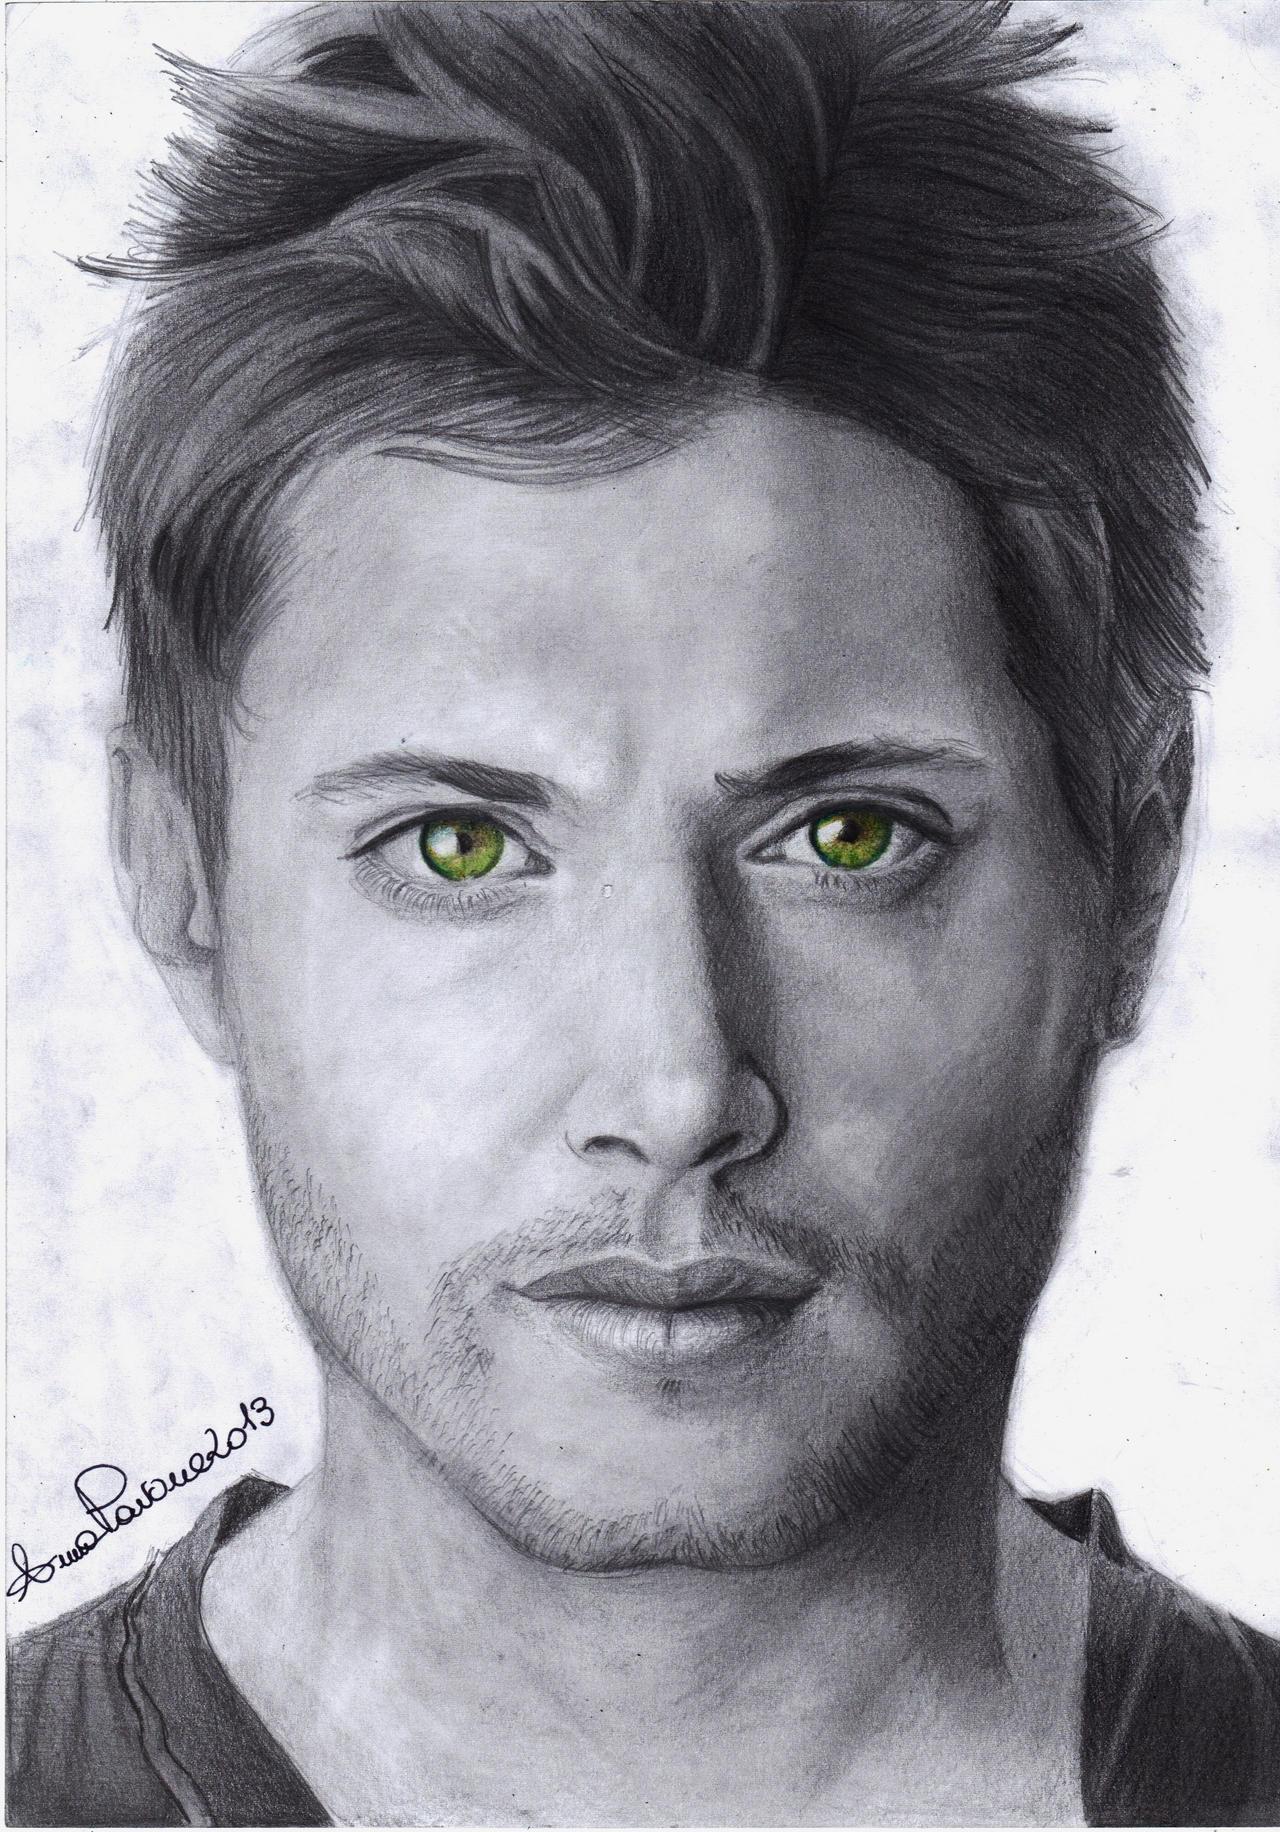 Jensen Ross Ackles Portrait by AoiSayzuki